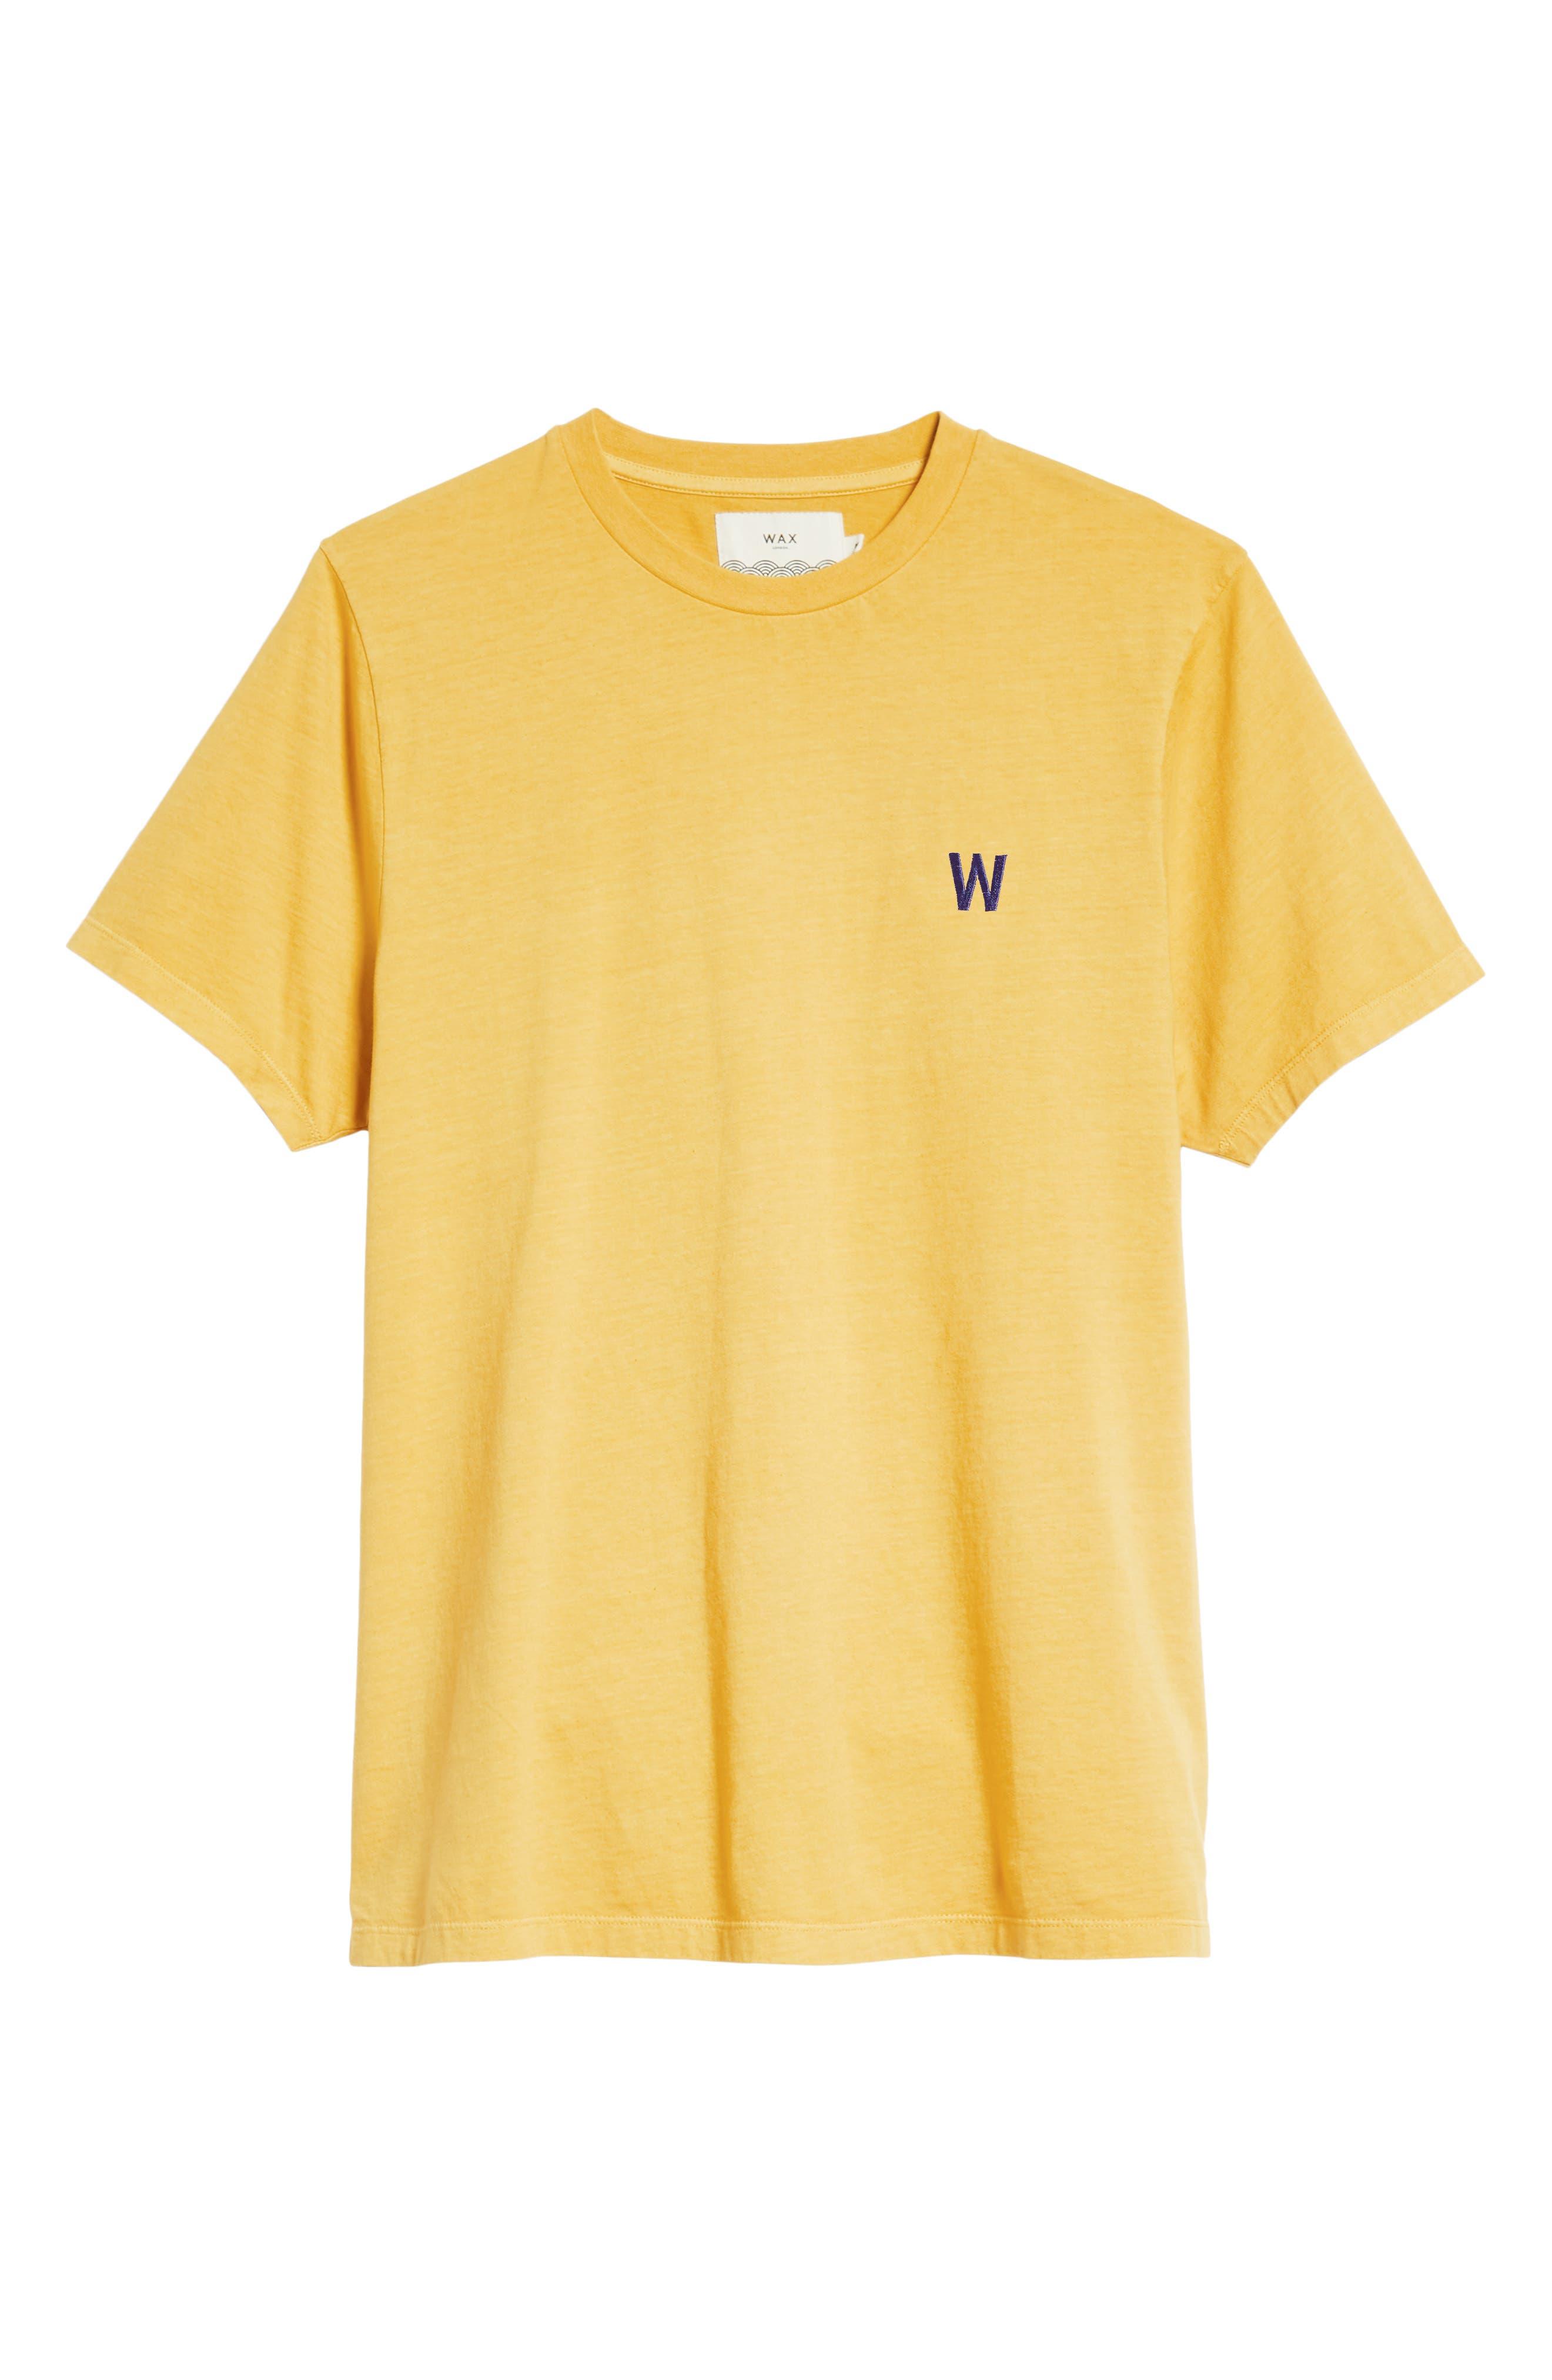 Reid T-Shirt,                             Alternate thumbnail 6, color,                             LEMON